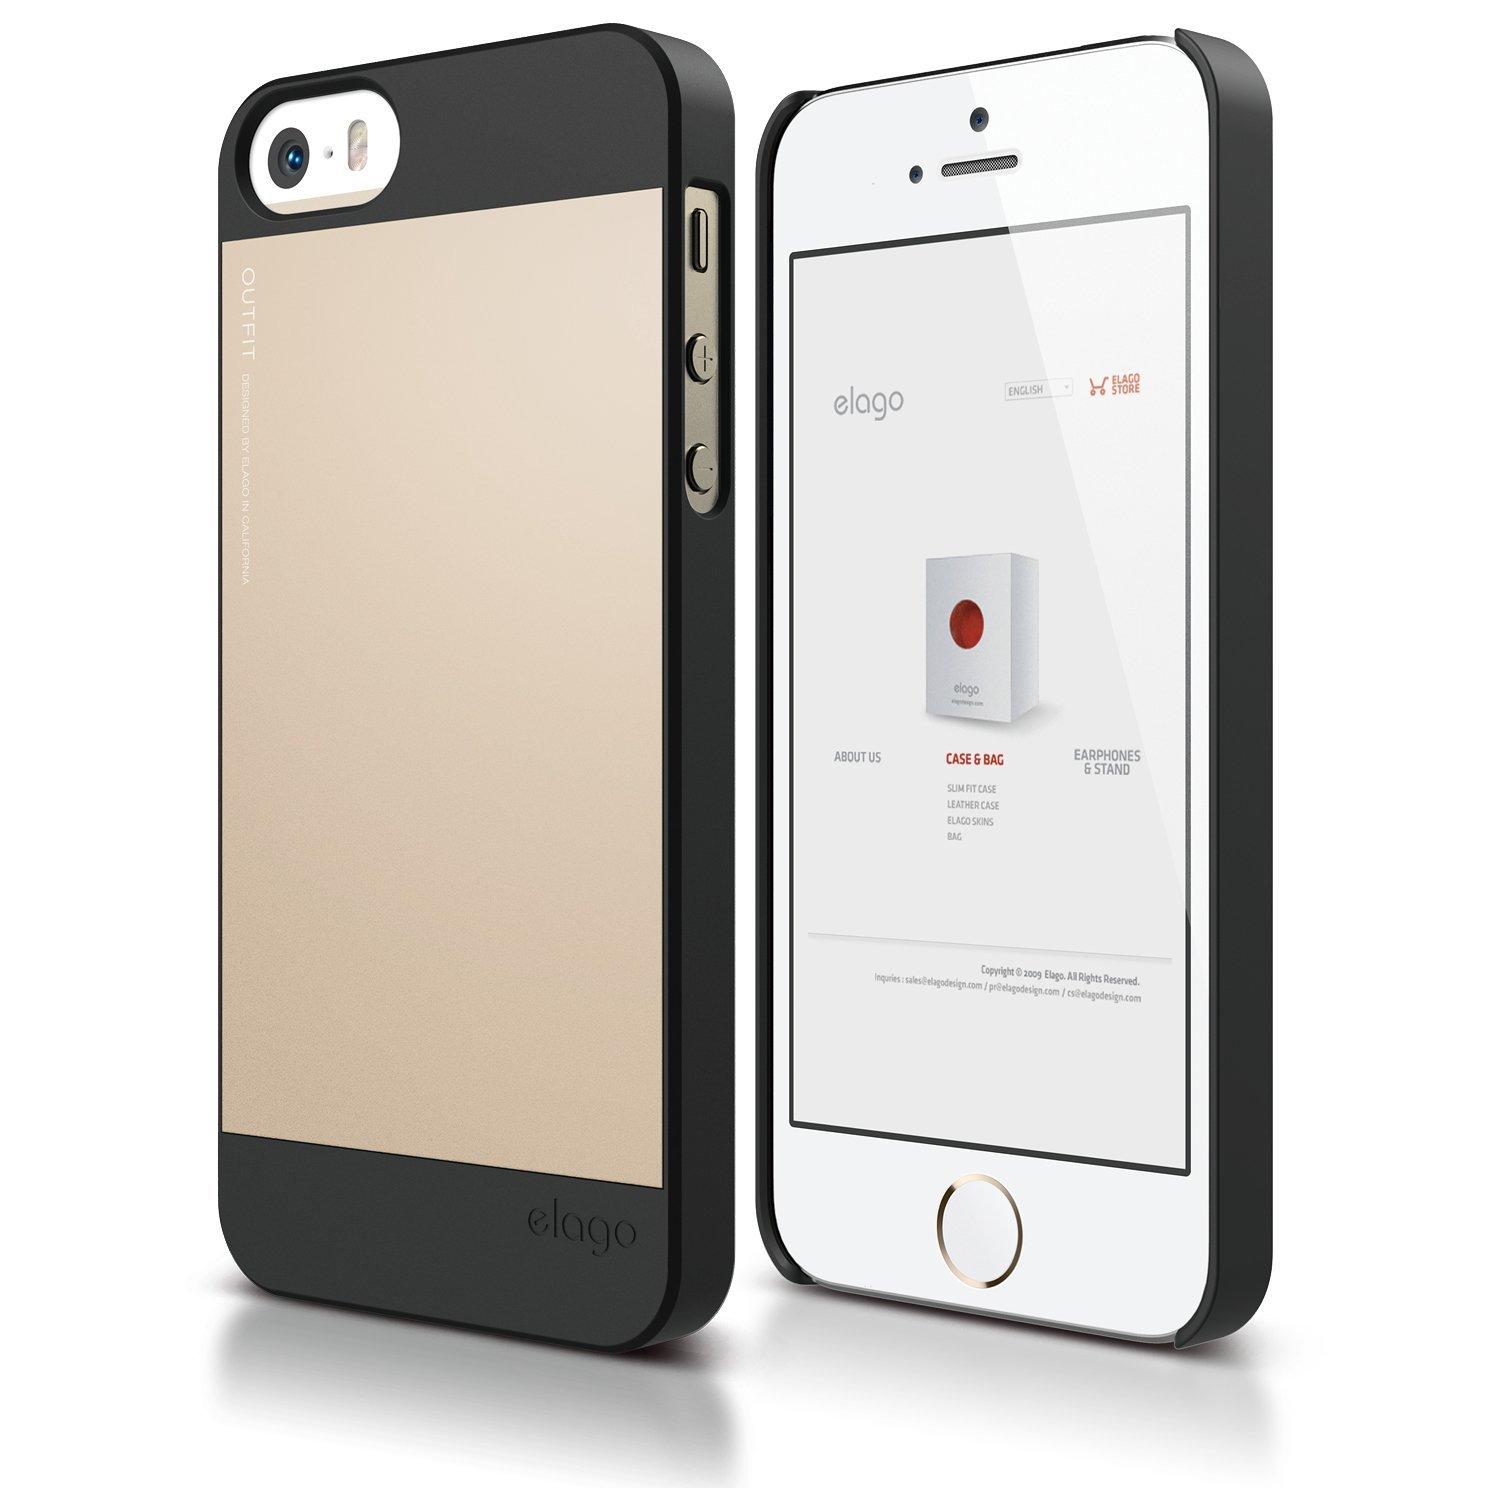 s5 outfit case for iphone 5 5s se black champagne gold. Black Bedroom Furniture Sets. Home Design Ideas